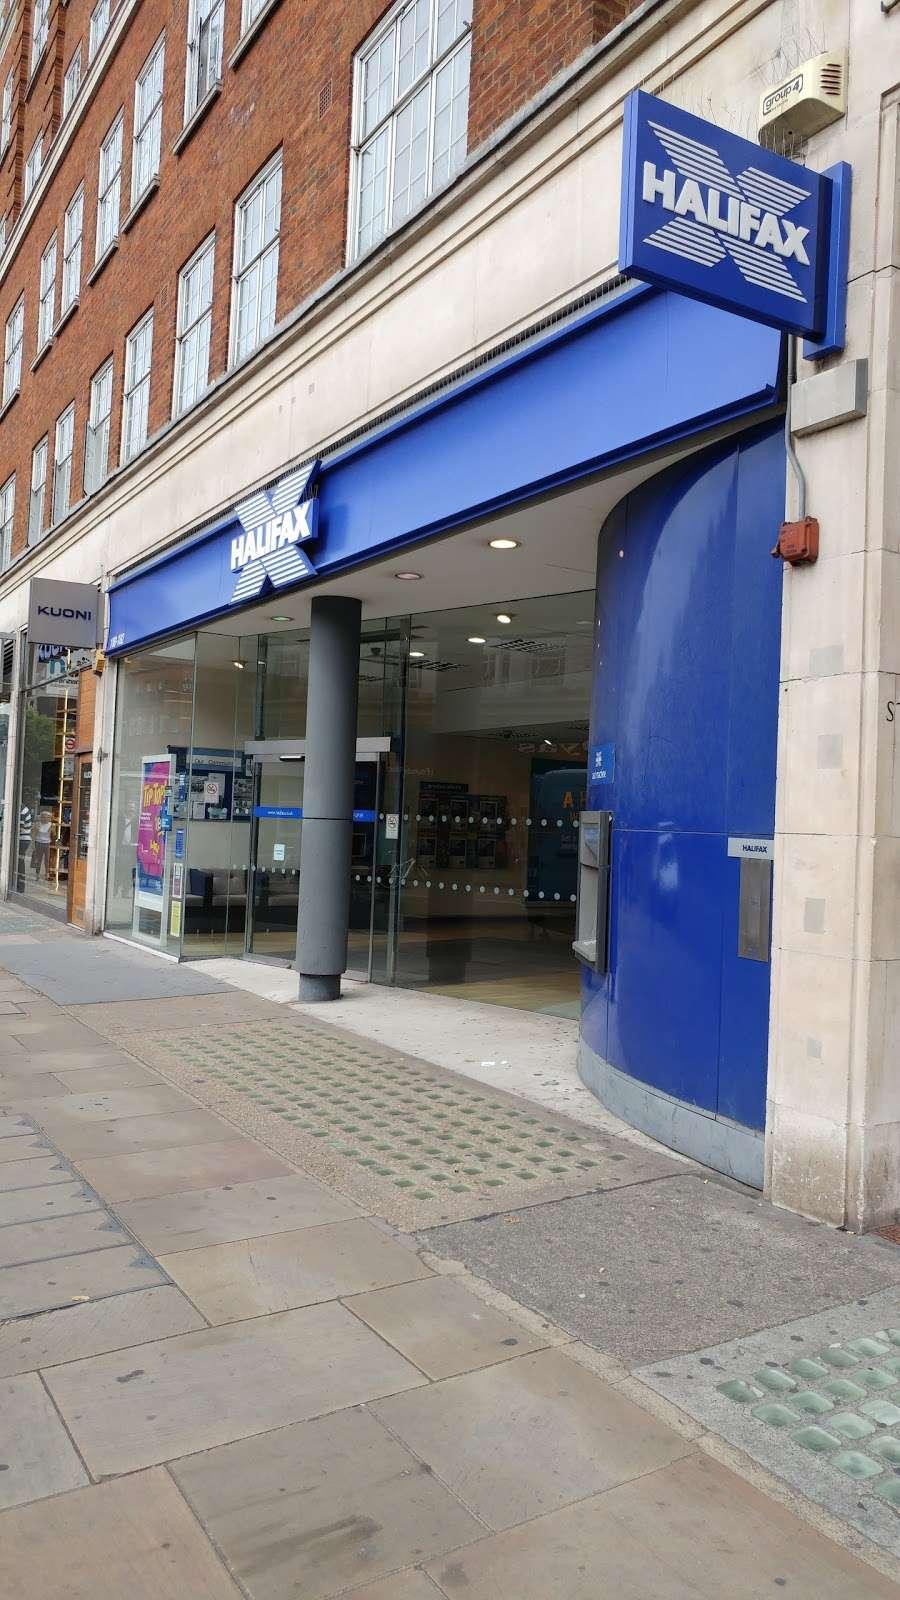 Halifax - bank  | Photo 3 of 5 | Address: 180, 182 Kensington High St, Kensington, London W8 7RR, UK | Phone: 020 7441 7630